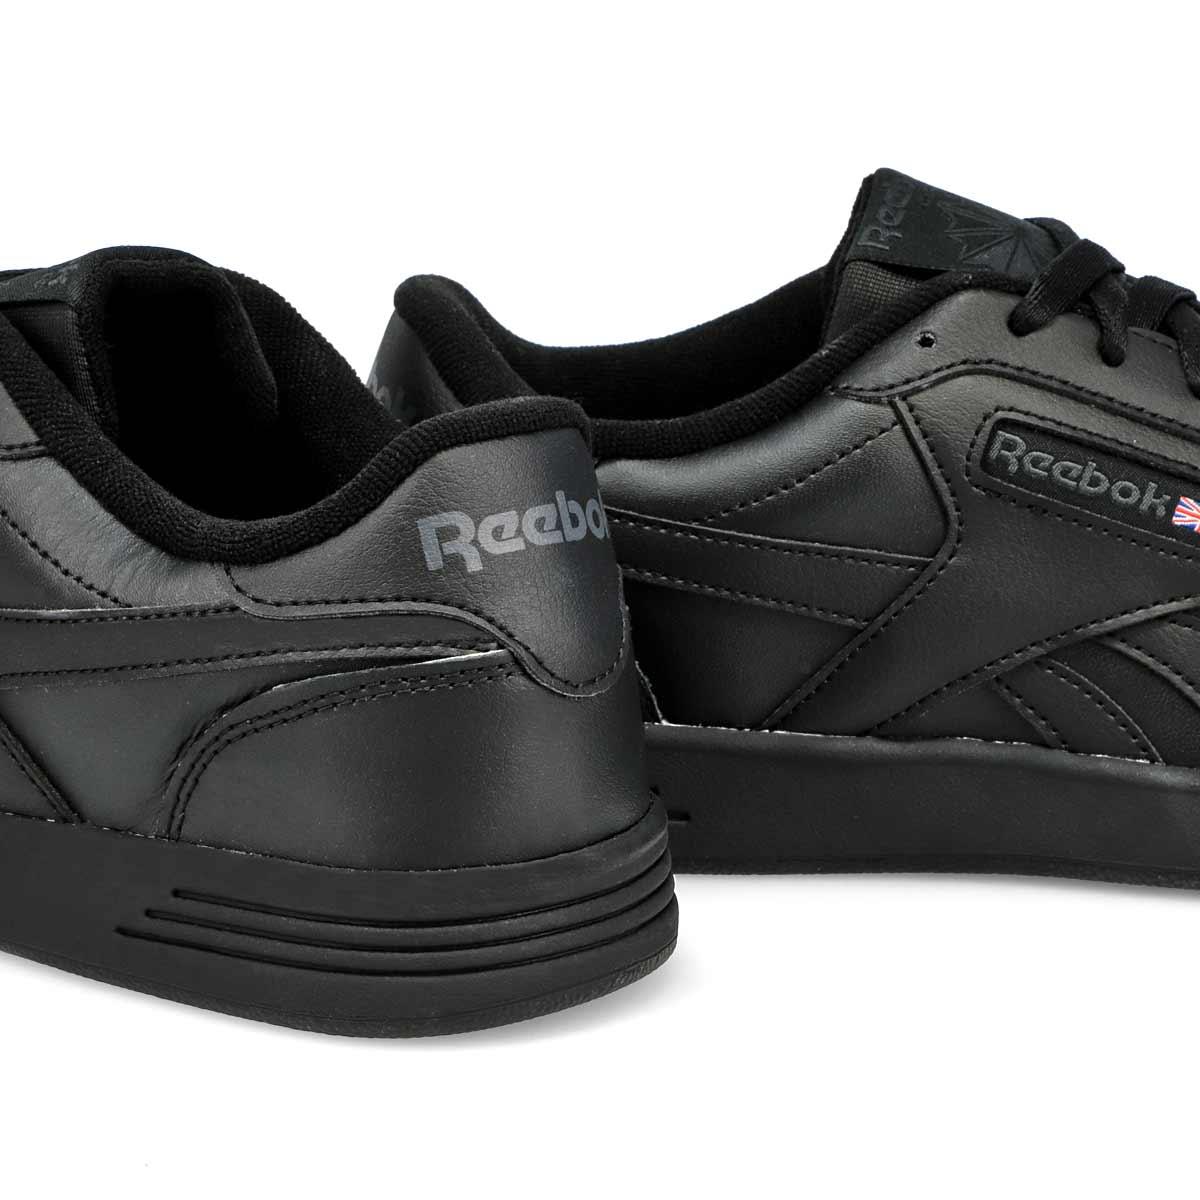 Men's Club Memt Sneaker - Black